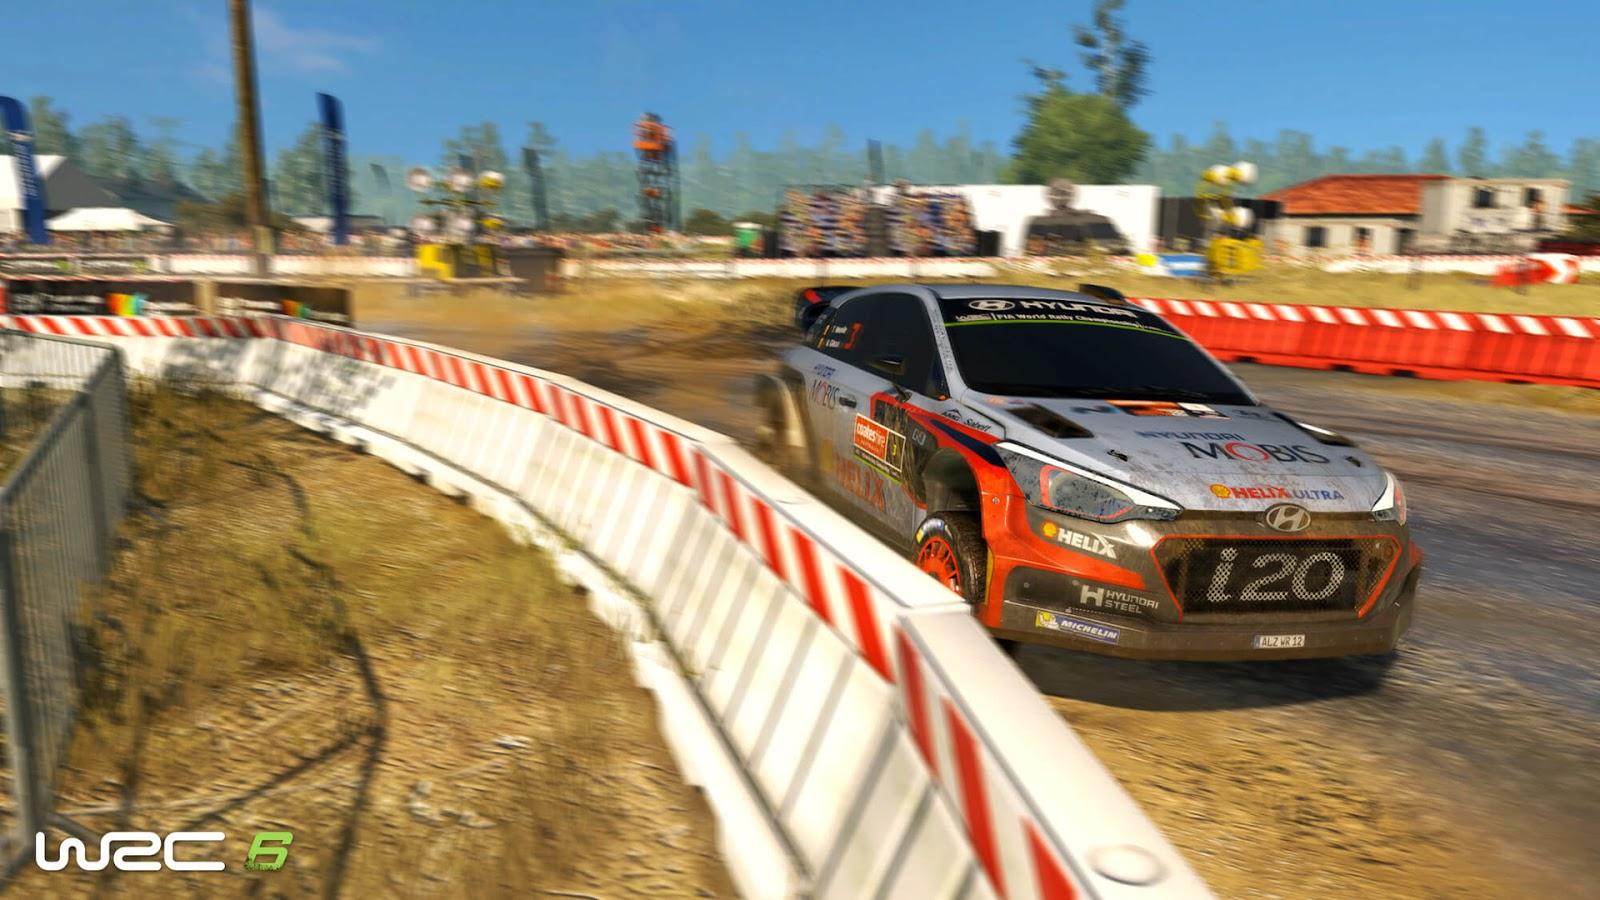 WRC 6 FIA World Rally Championship ESPAÑOL PC (STEAMPUNKS) + REPACK 4 DVD5 (JPW) 2